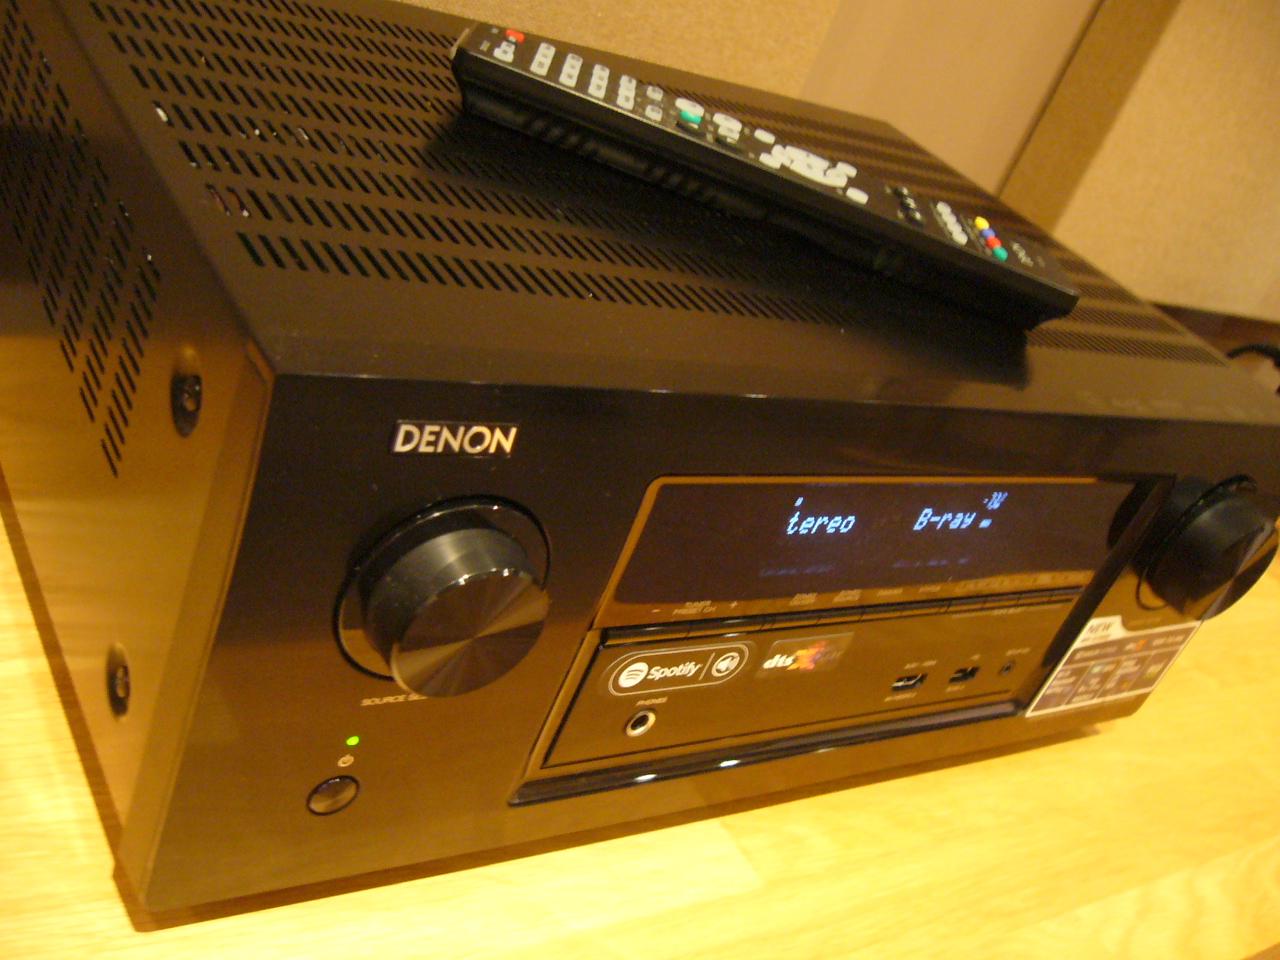 We will start by showing the AWARD WINNING  AVRX2300  AV receiver running a 5.1.2 Dolby Atmos set up.